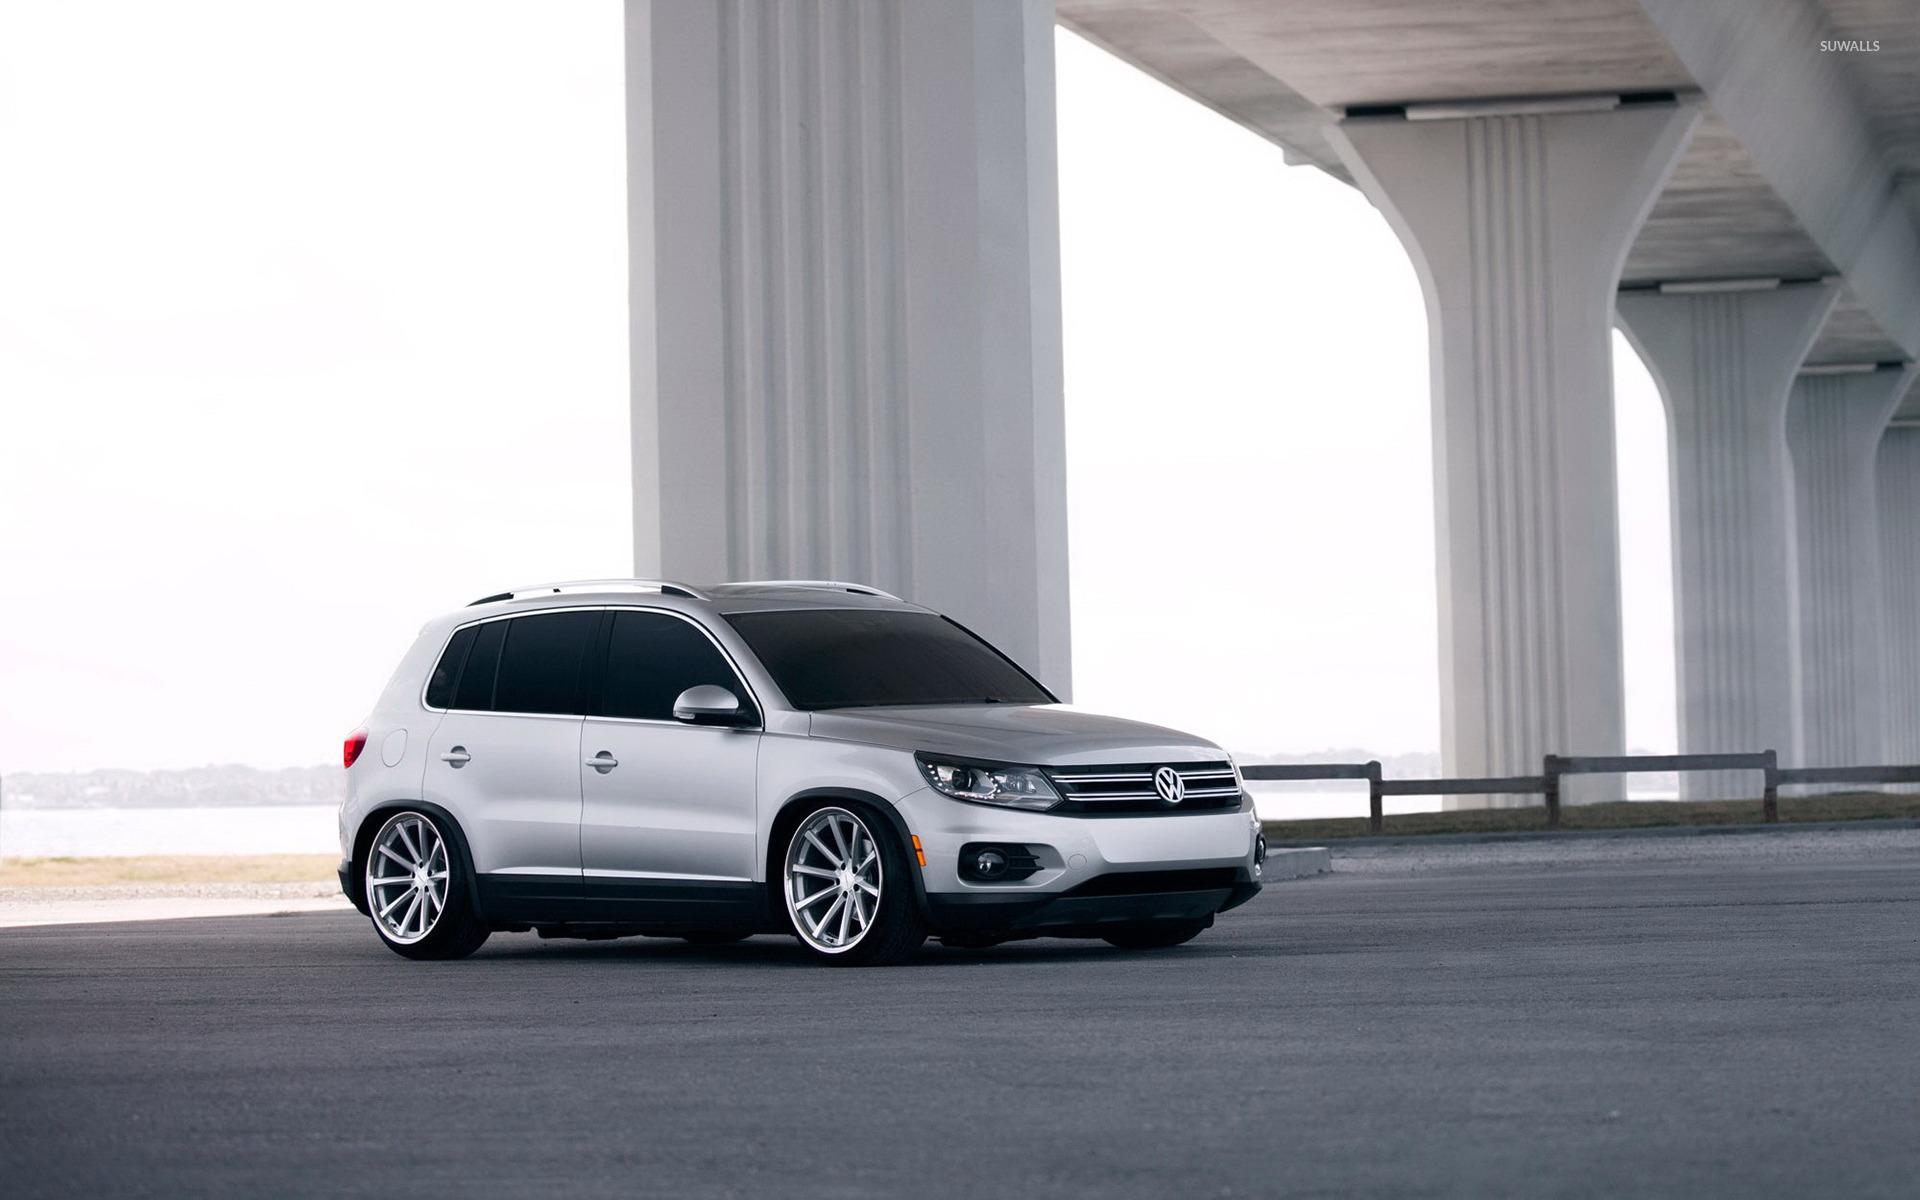 Free Bmw Car Wallpapers Download Volkswagen Tiguan Under A Bridge Wallpaper Car